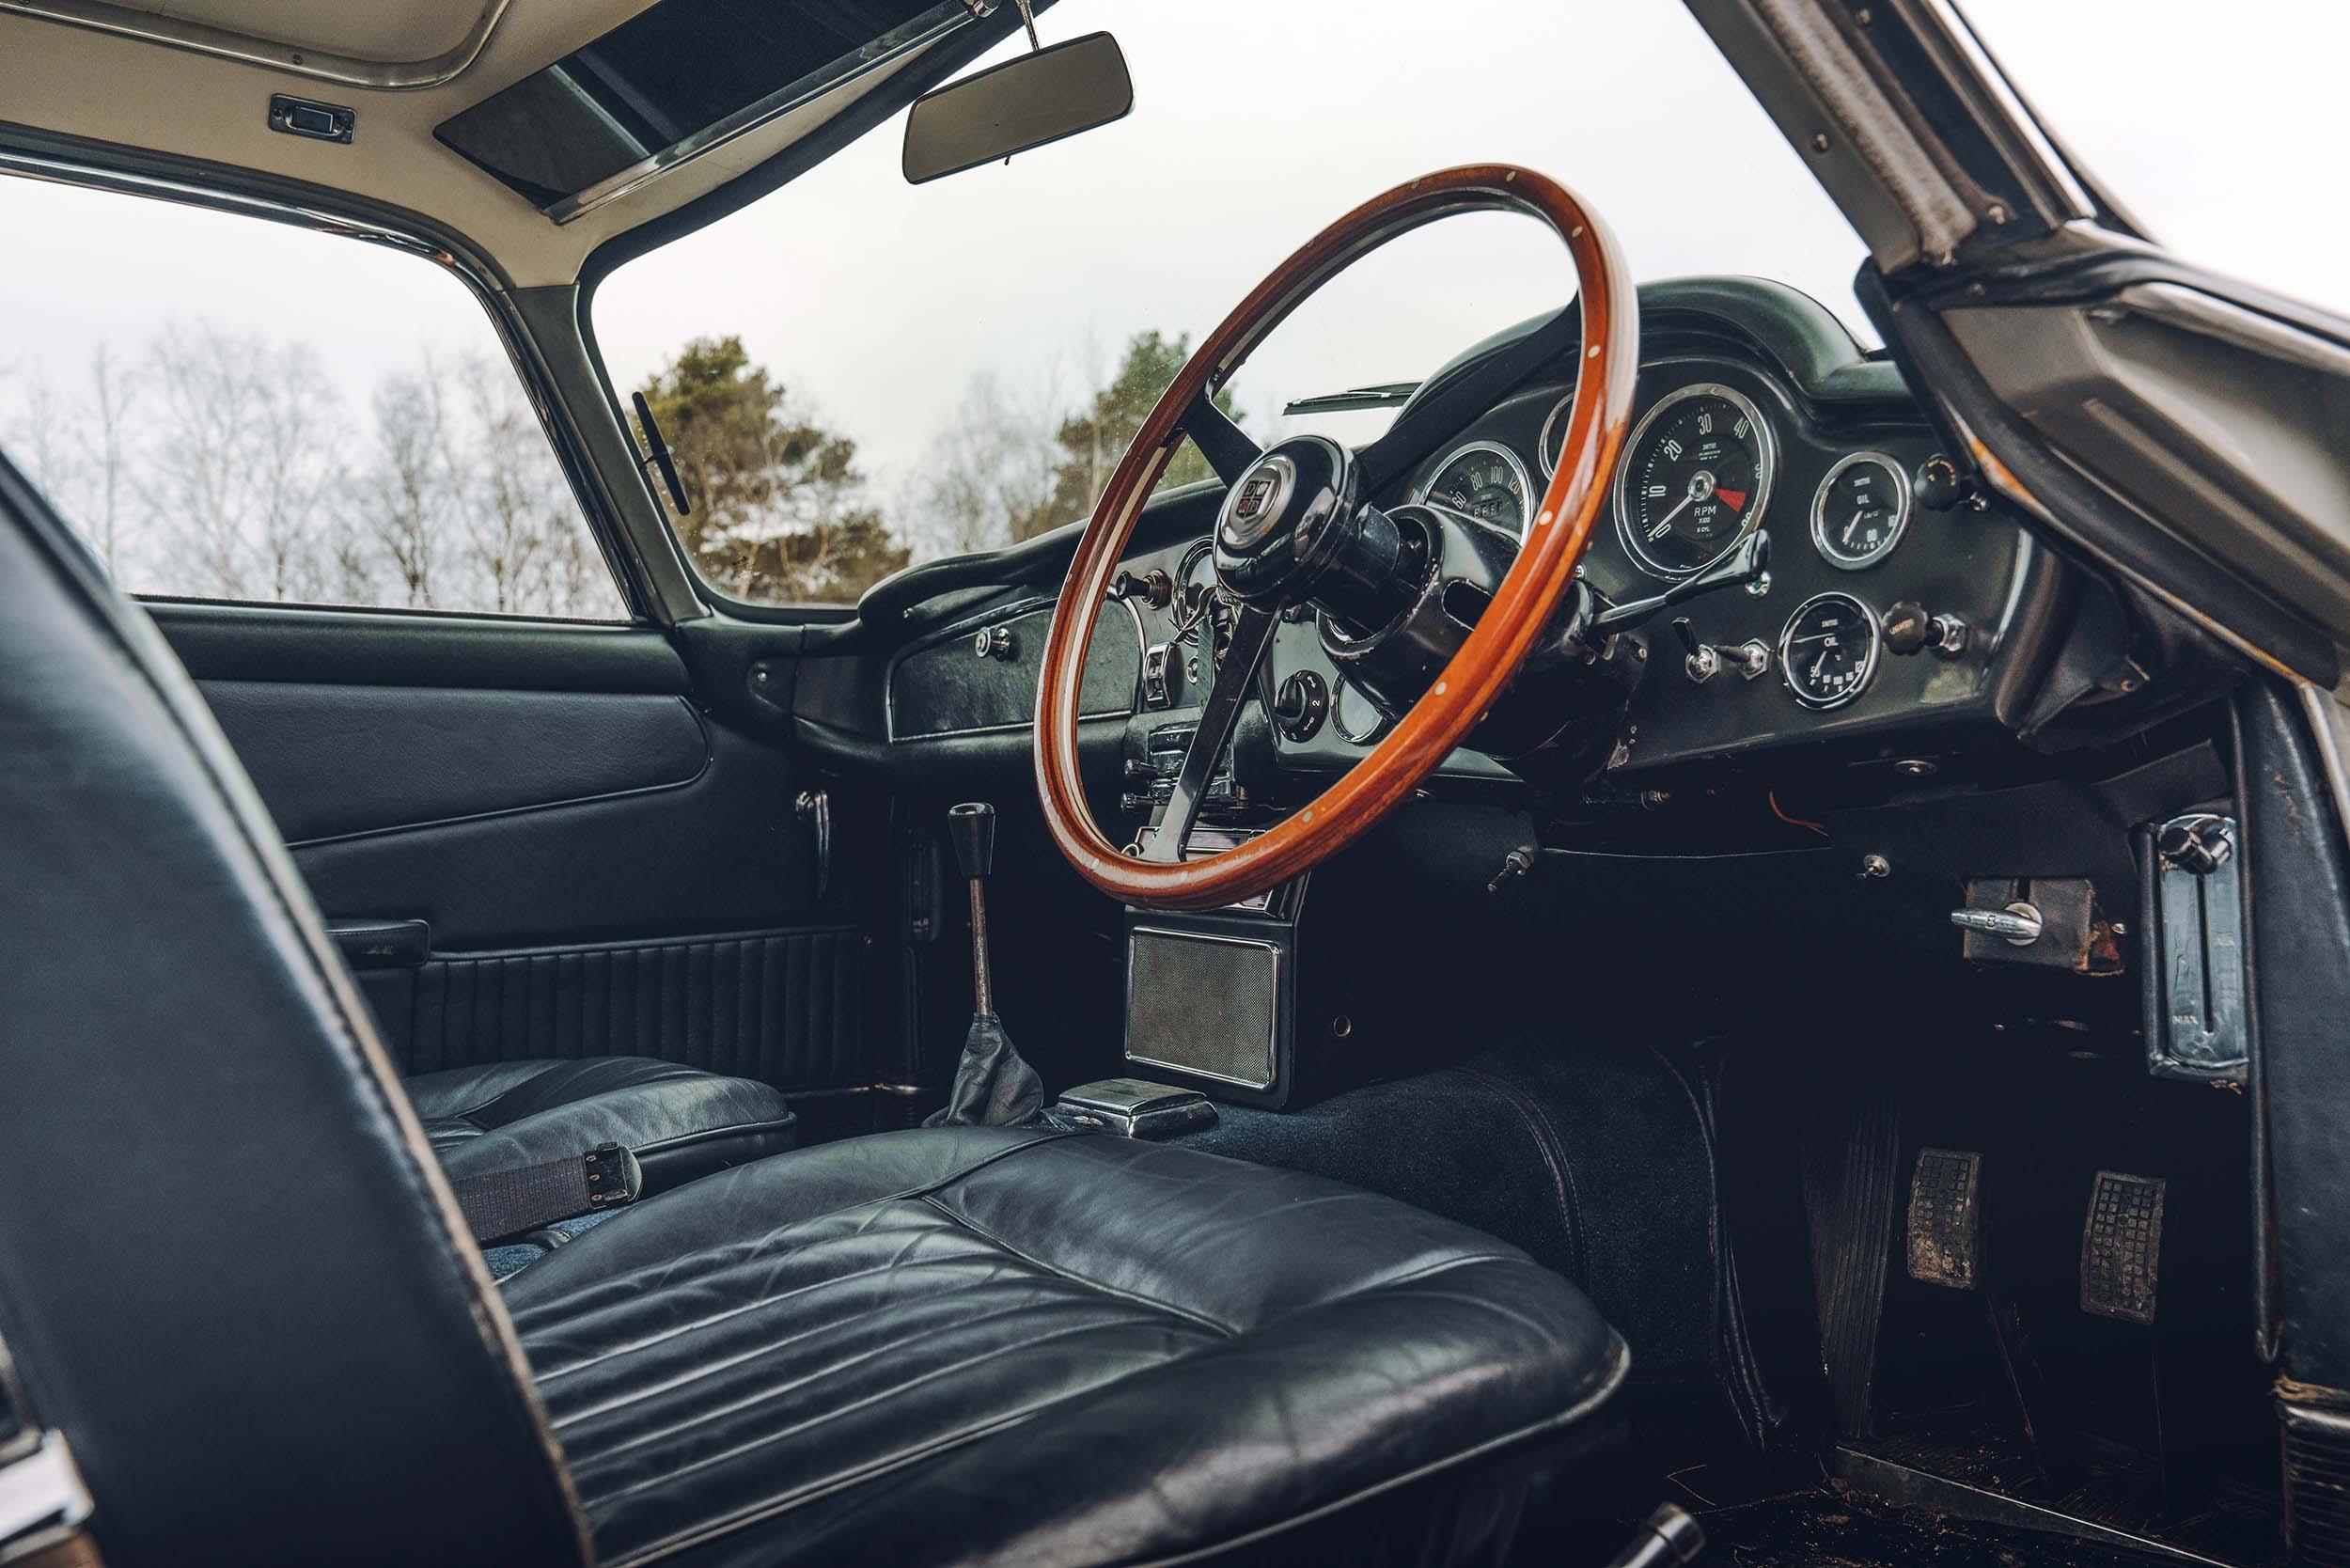 interieur Aston Martin DB5 van James Bond (007)